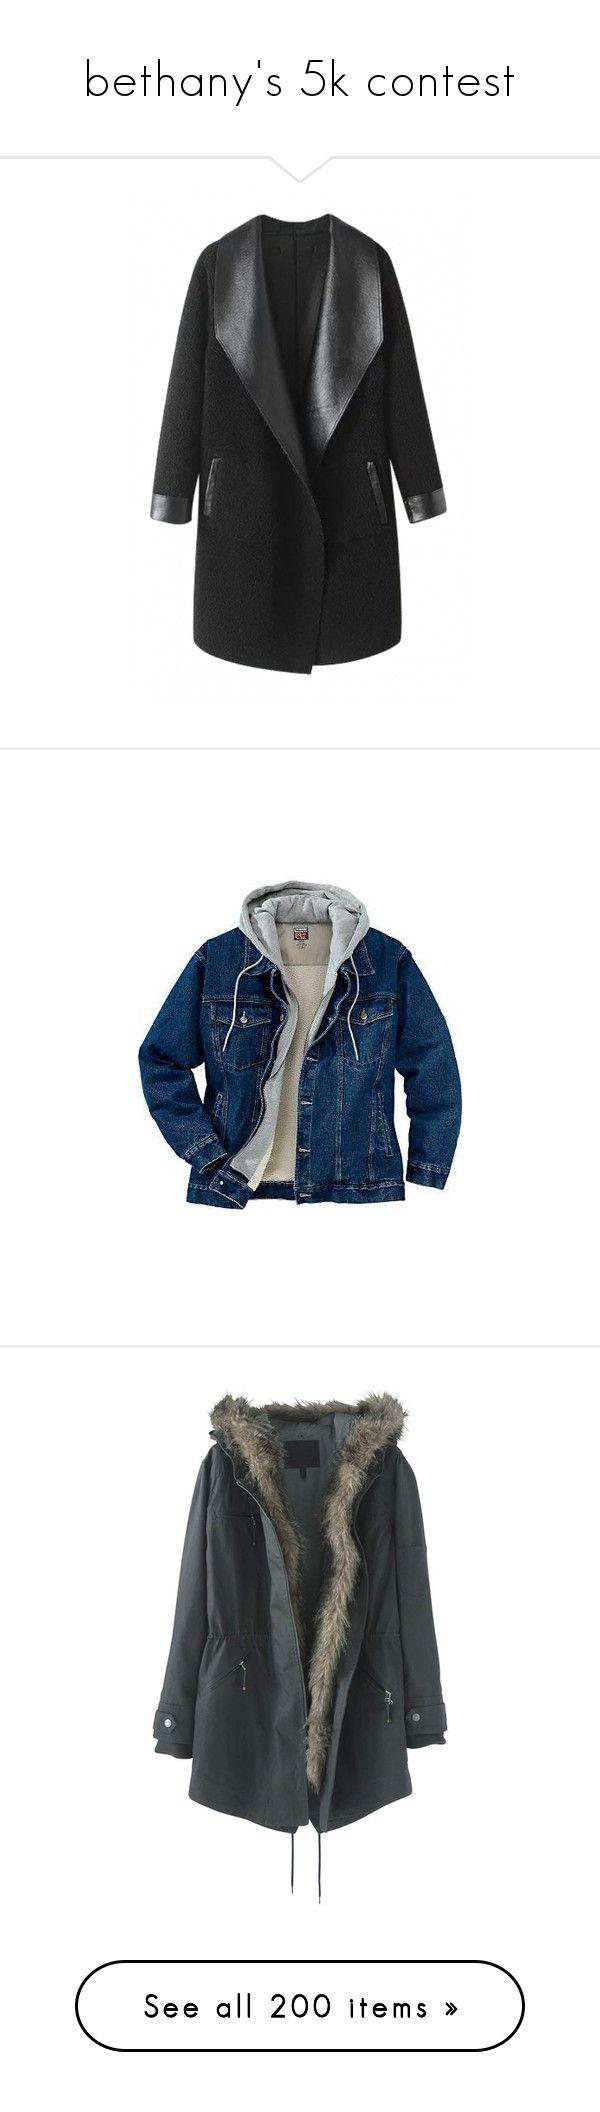 """bethany's 5k contest"" by brdfrdzen ❤ liked on Polyvore featuring TalisLittleTag, gottatagrandomn3ss, kikitags, outerwear, coats, jackets, coats & jackets, casaco, lapel coat and imitation fur coats"